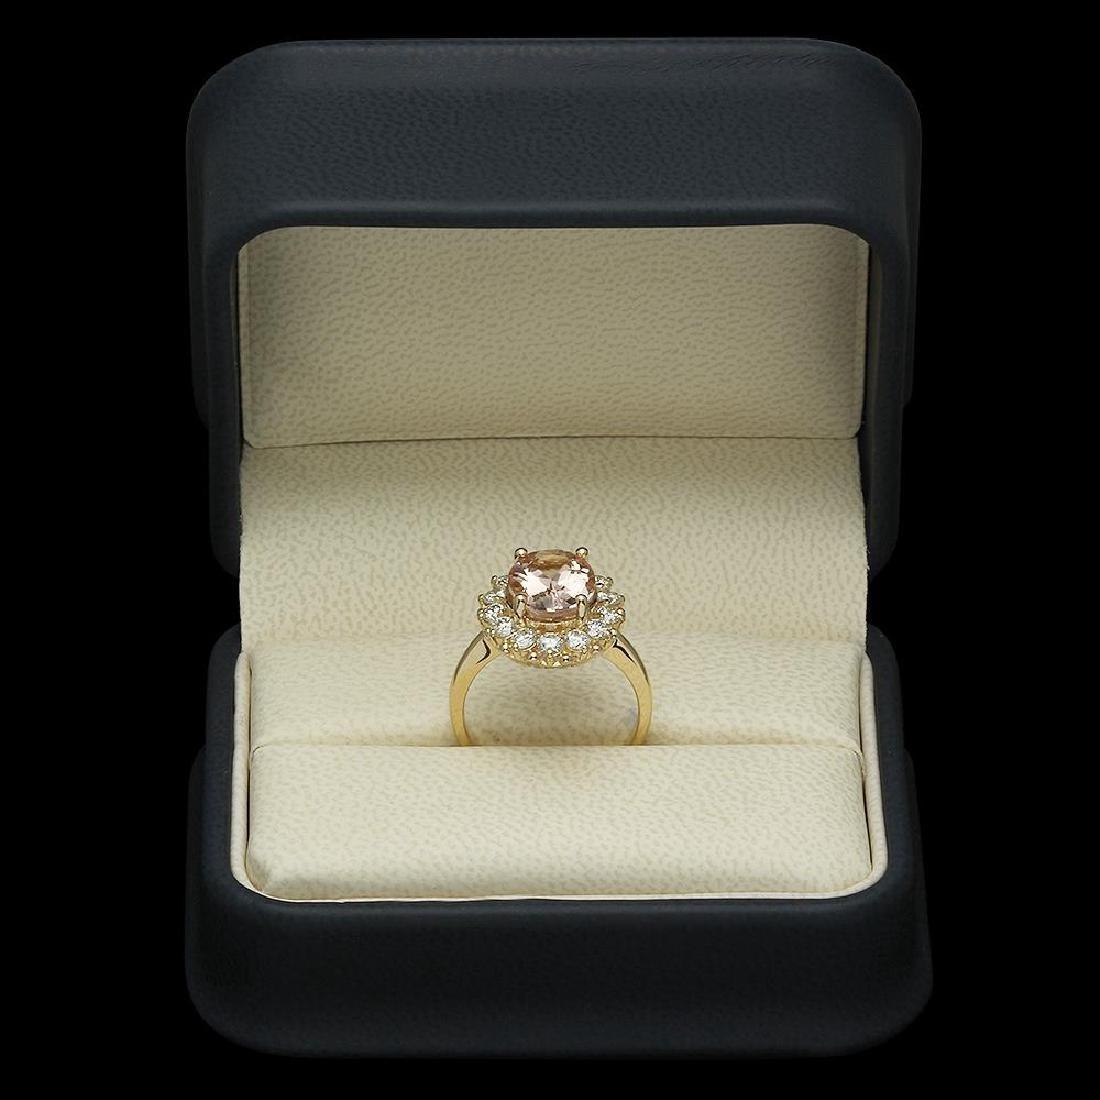 14K Gold 3.23ct Morganite 1.09ct Diamond Ring - 4